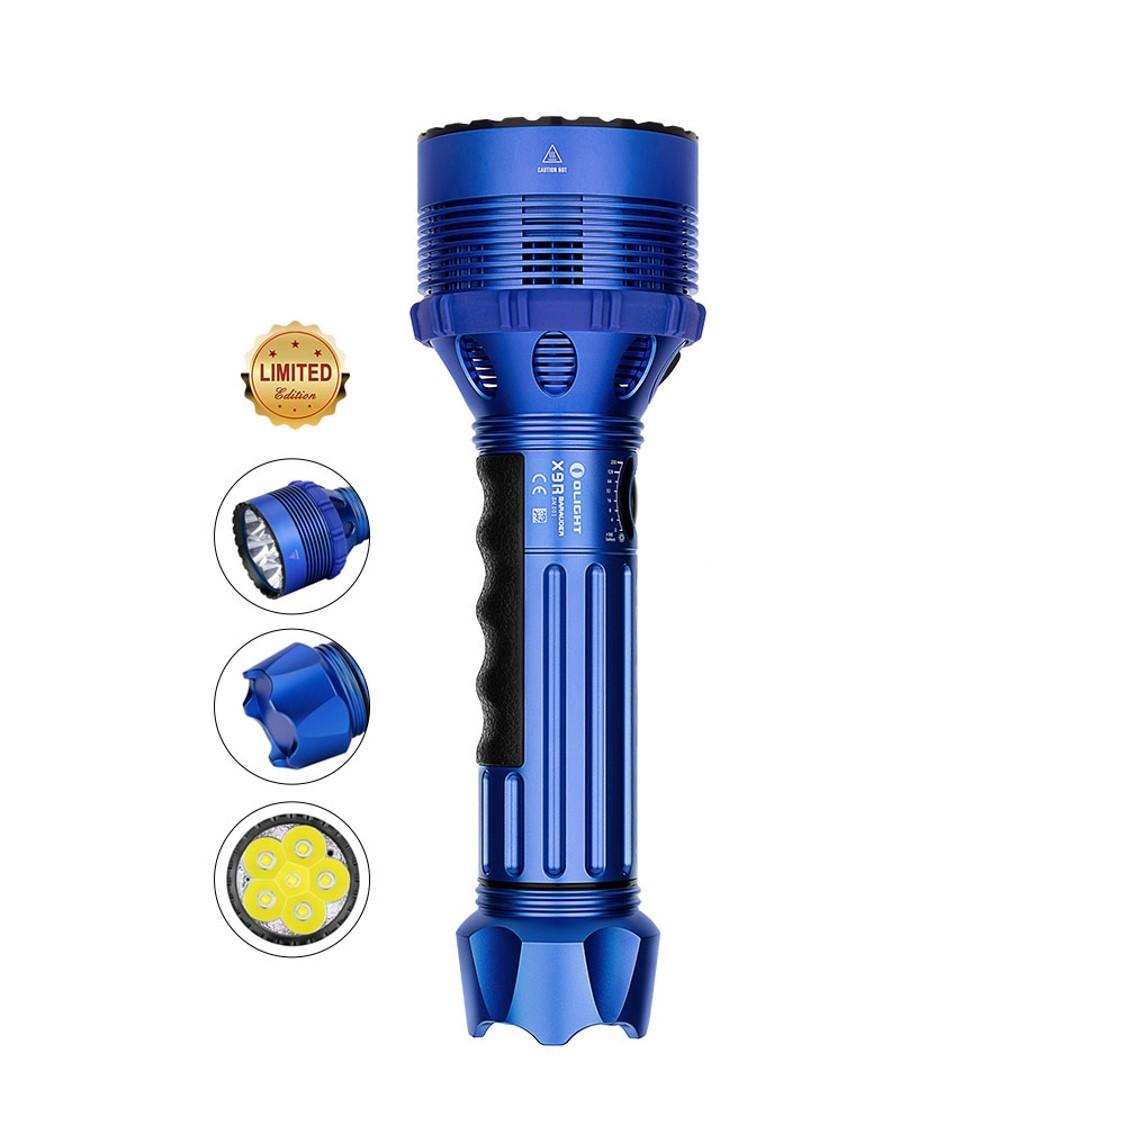 Olight X9R Blue High Lumen Flashlight